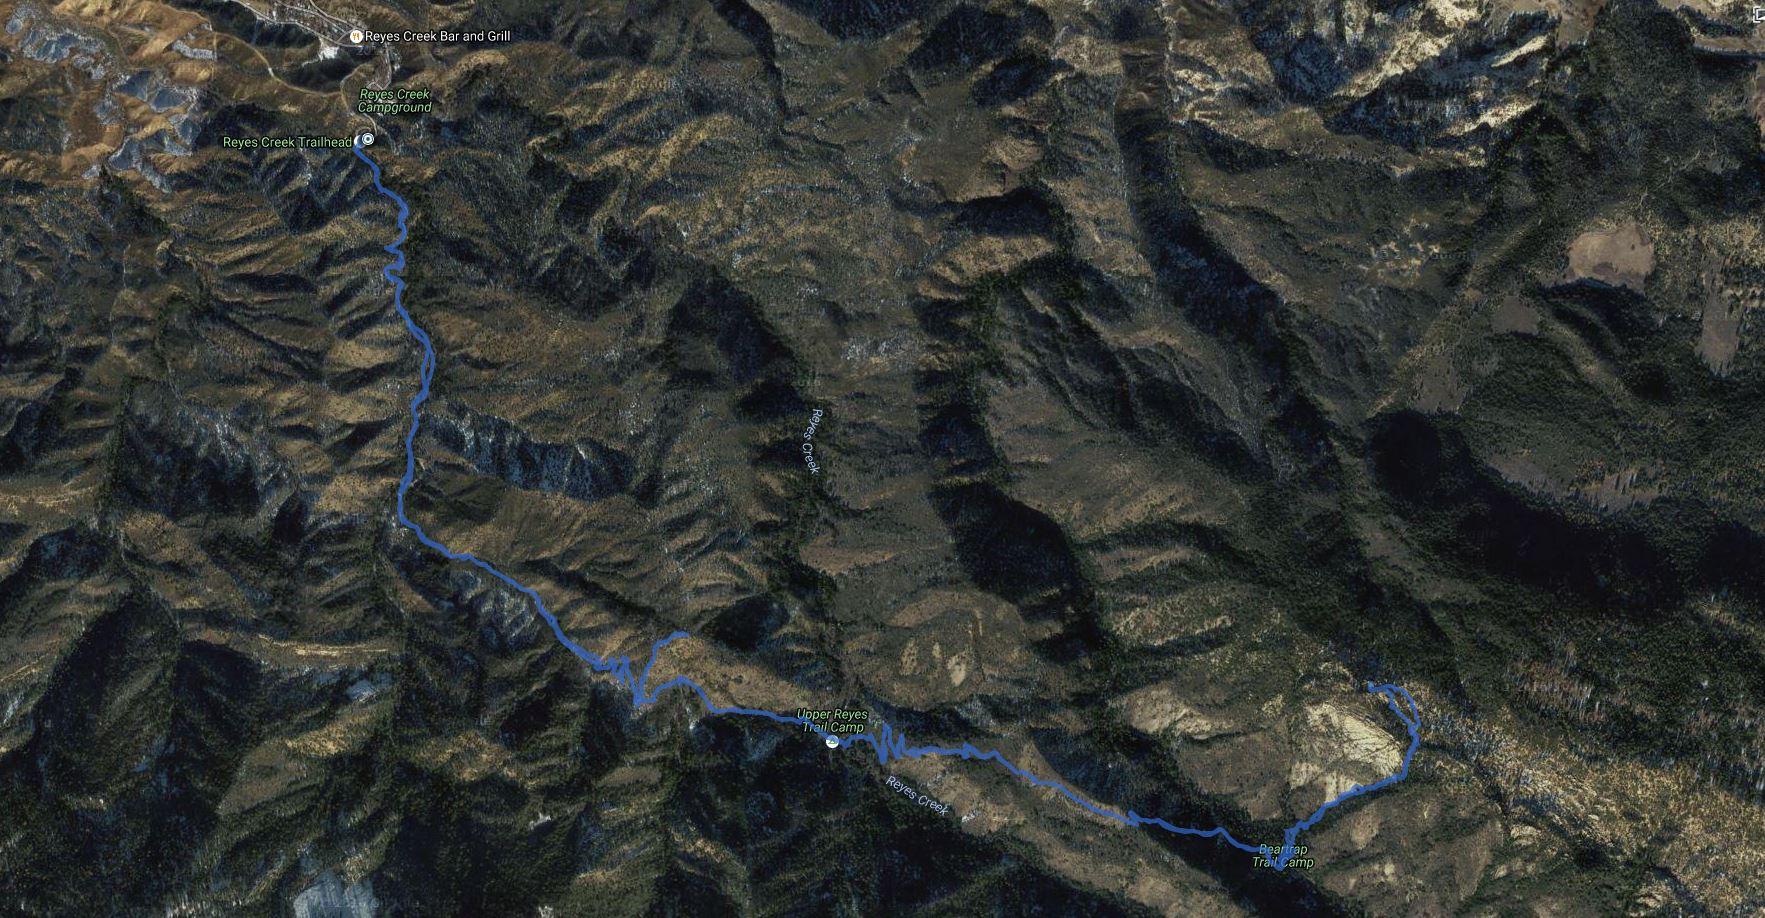 Beartrap Bluff, Peak 5180 – GPS Track | Patrick ONeill's